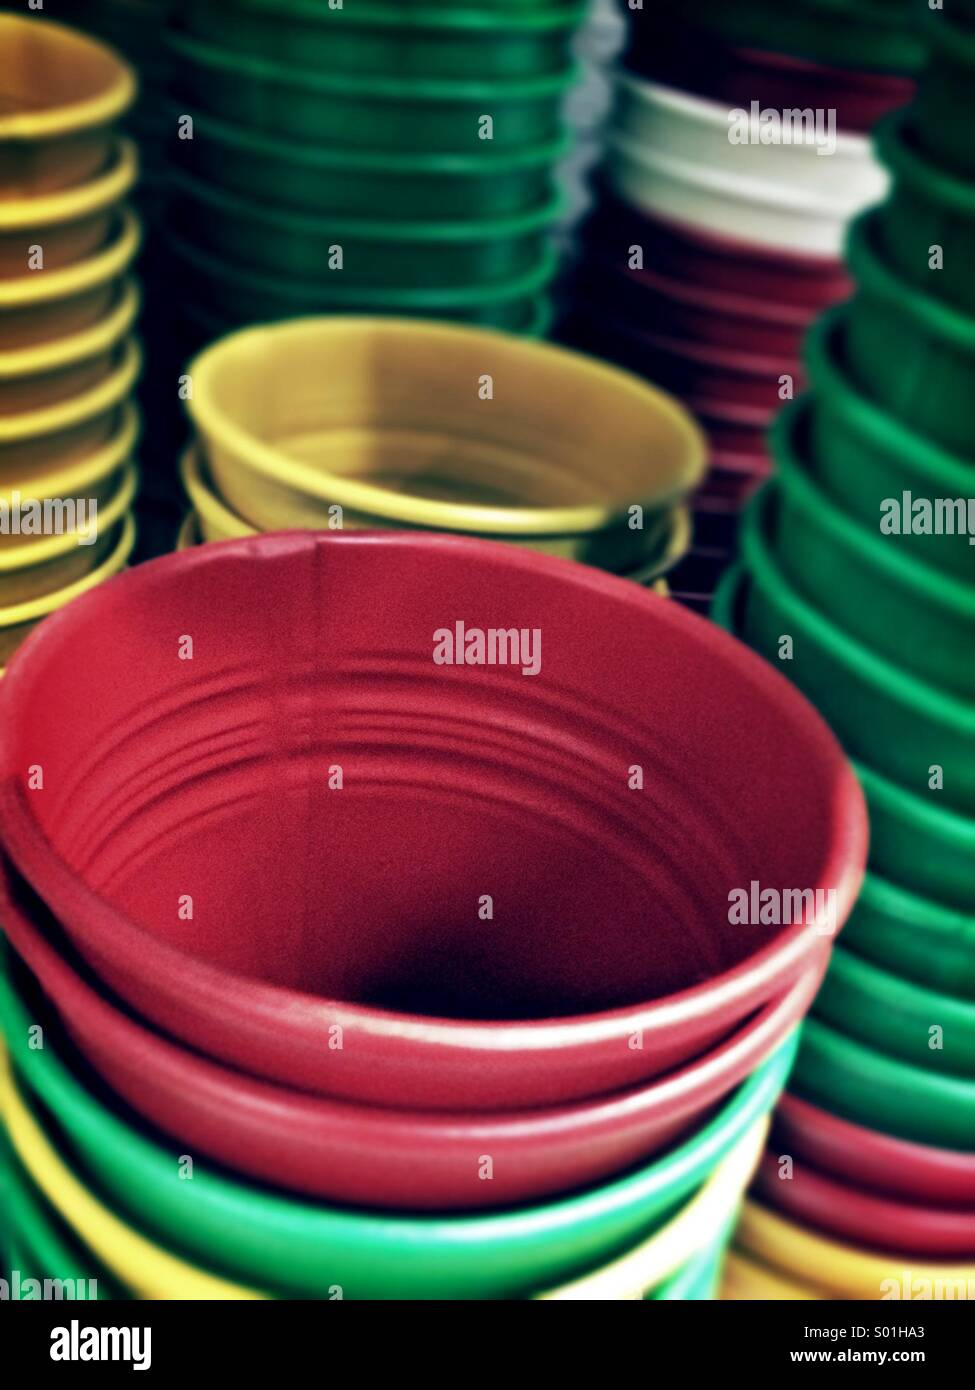 Colore vasi per piante Immagini Stock